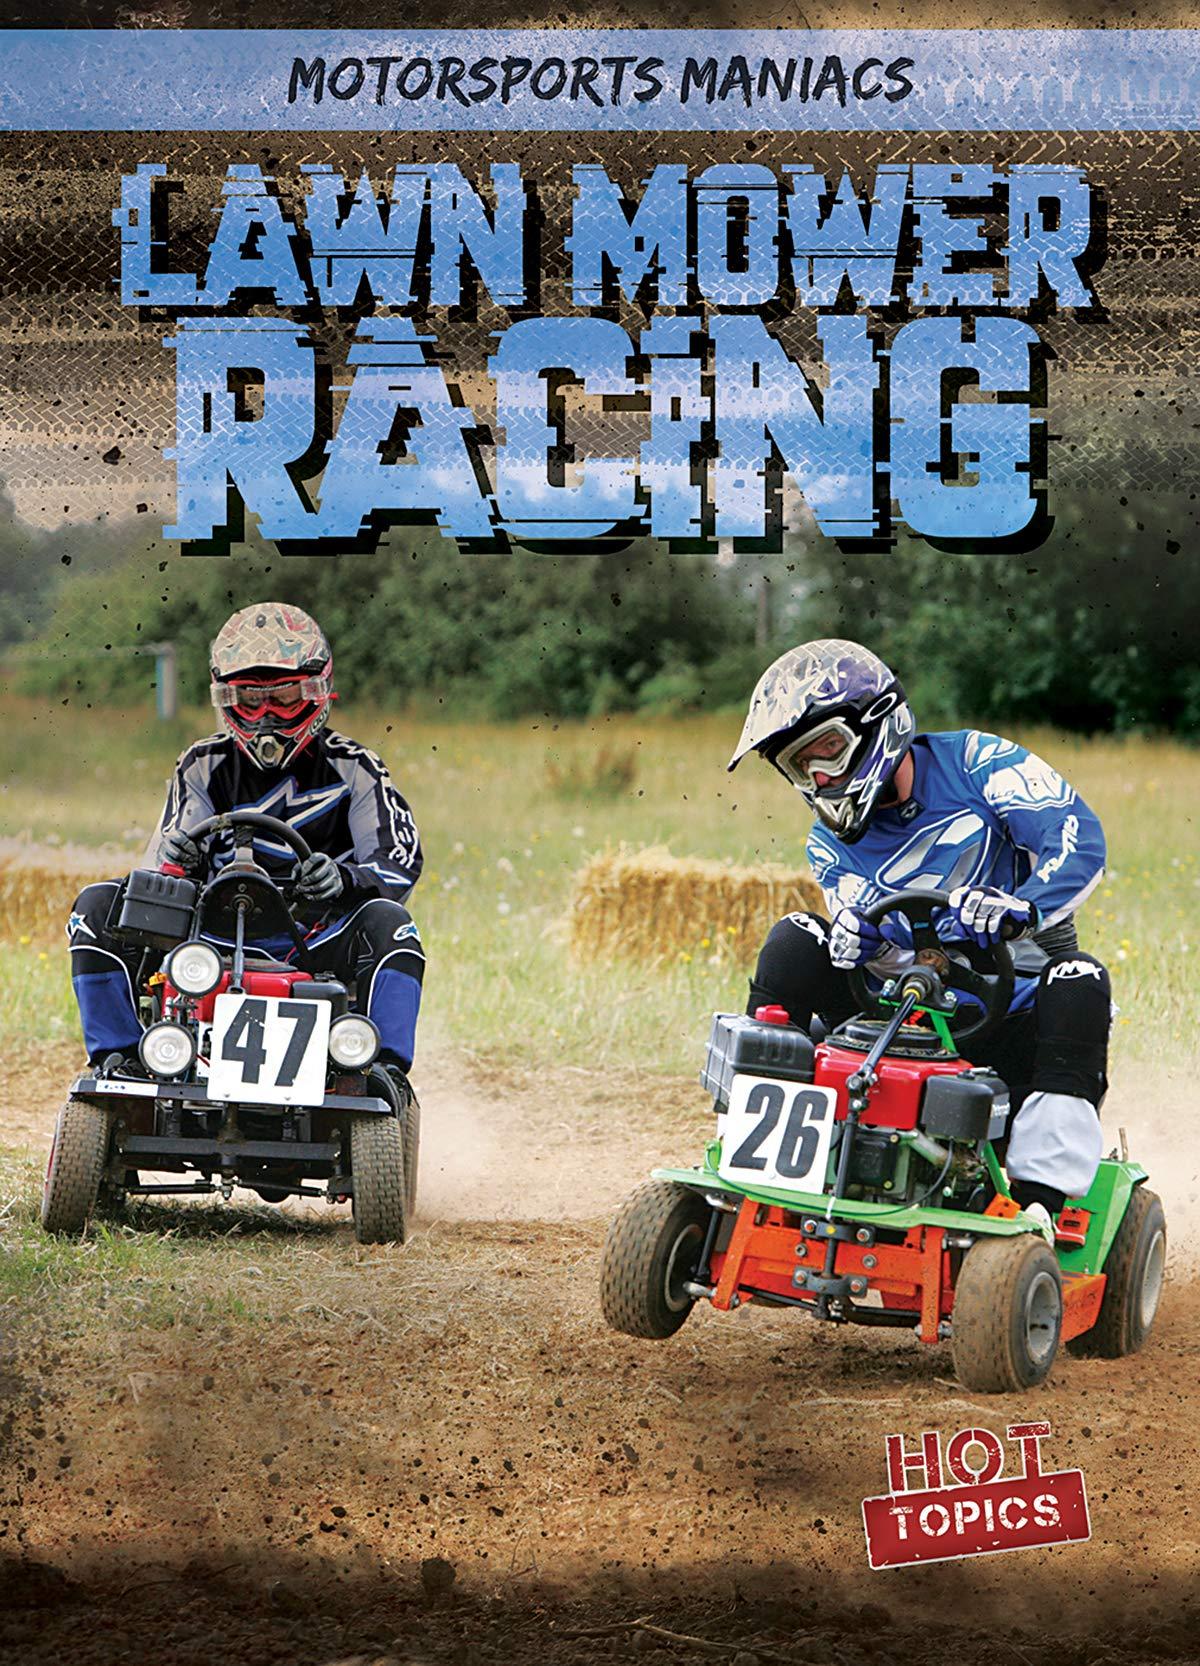 Lawn Mower Racing >> Lawn Mower Racing Motorsports Maniacs Kate Mikoley